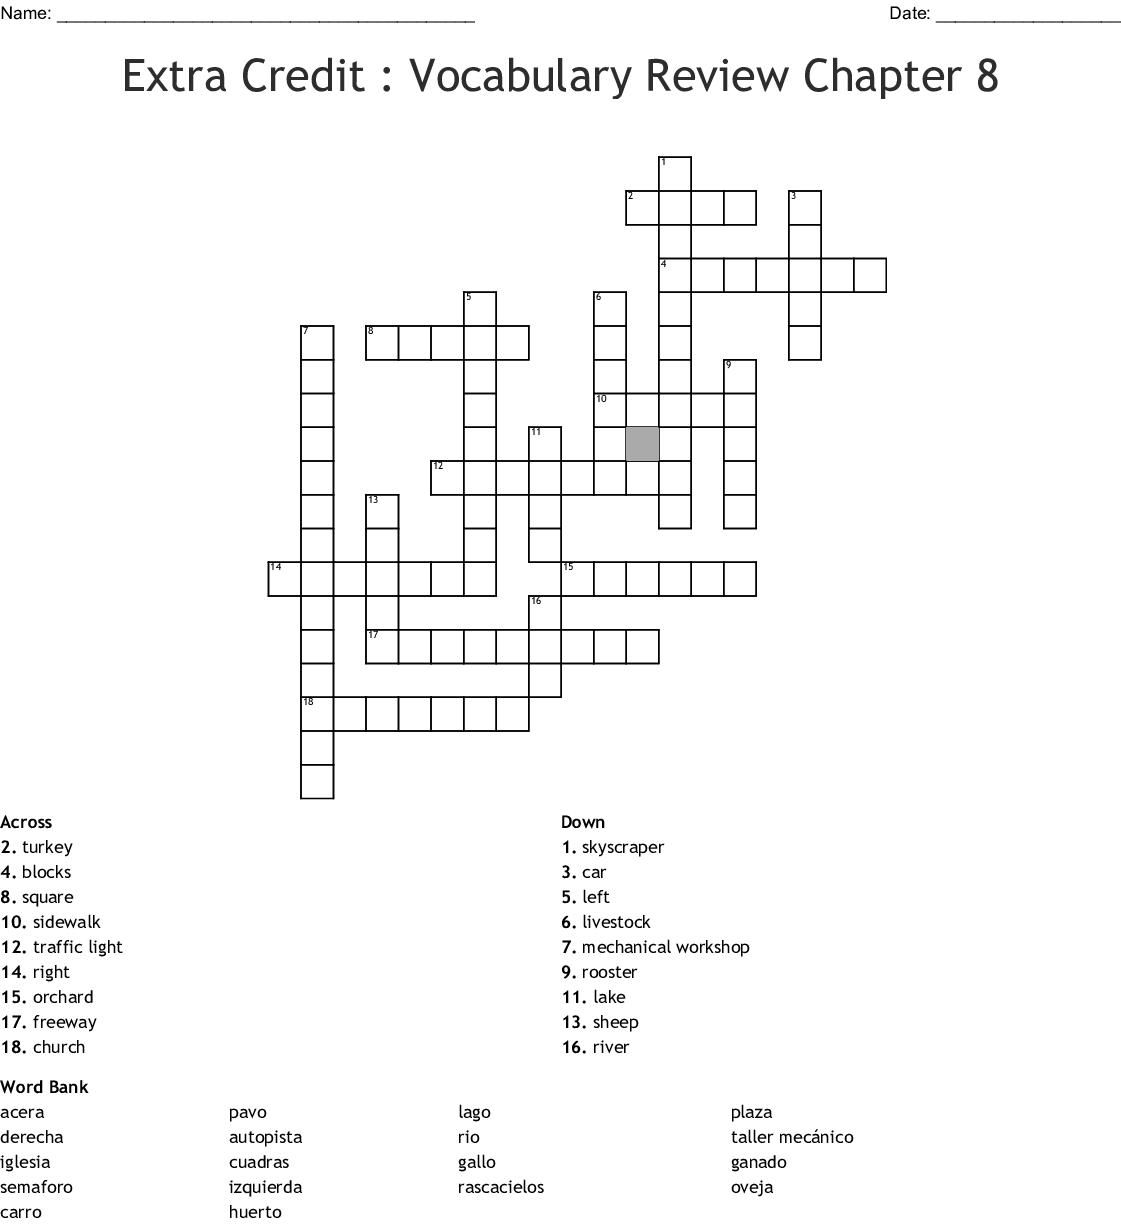 Repaso Del Capitulo Crucigrama 3b 8 Crossword Answers